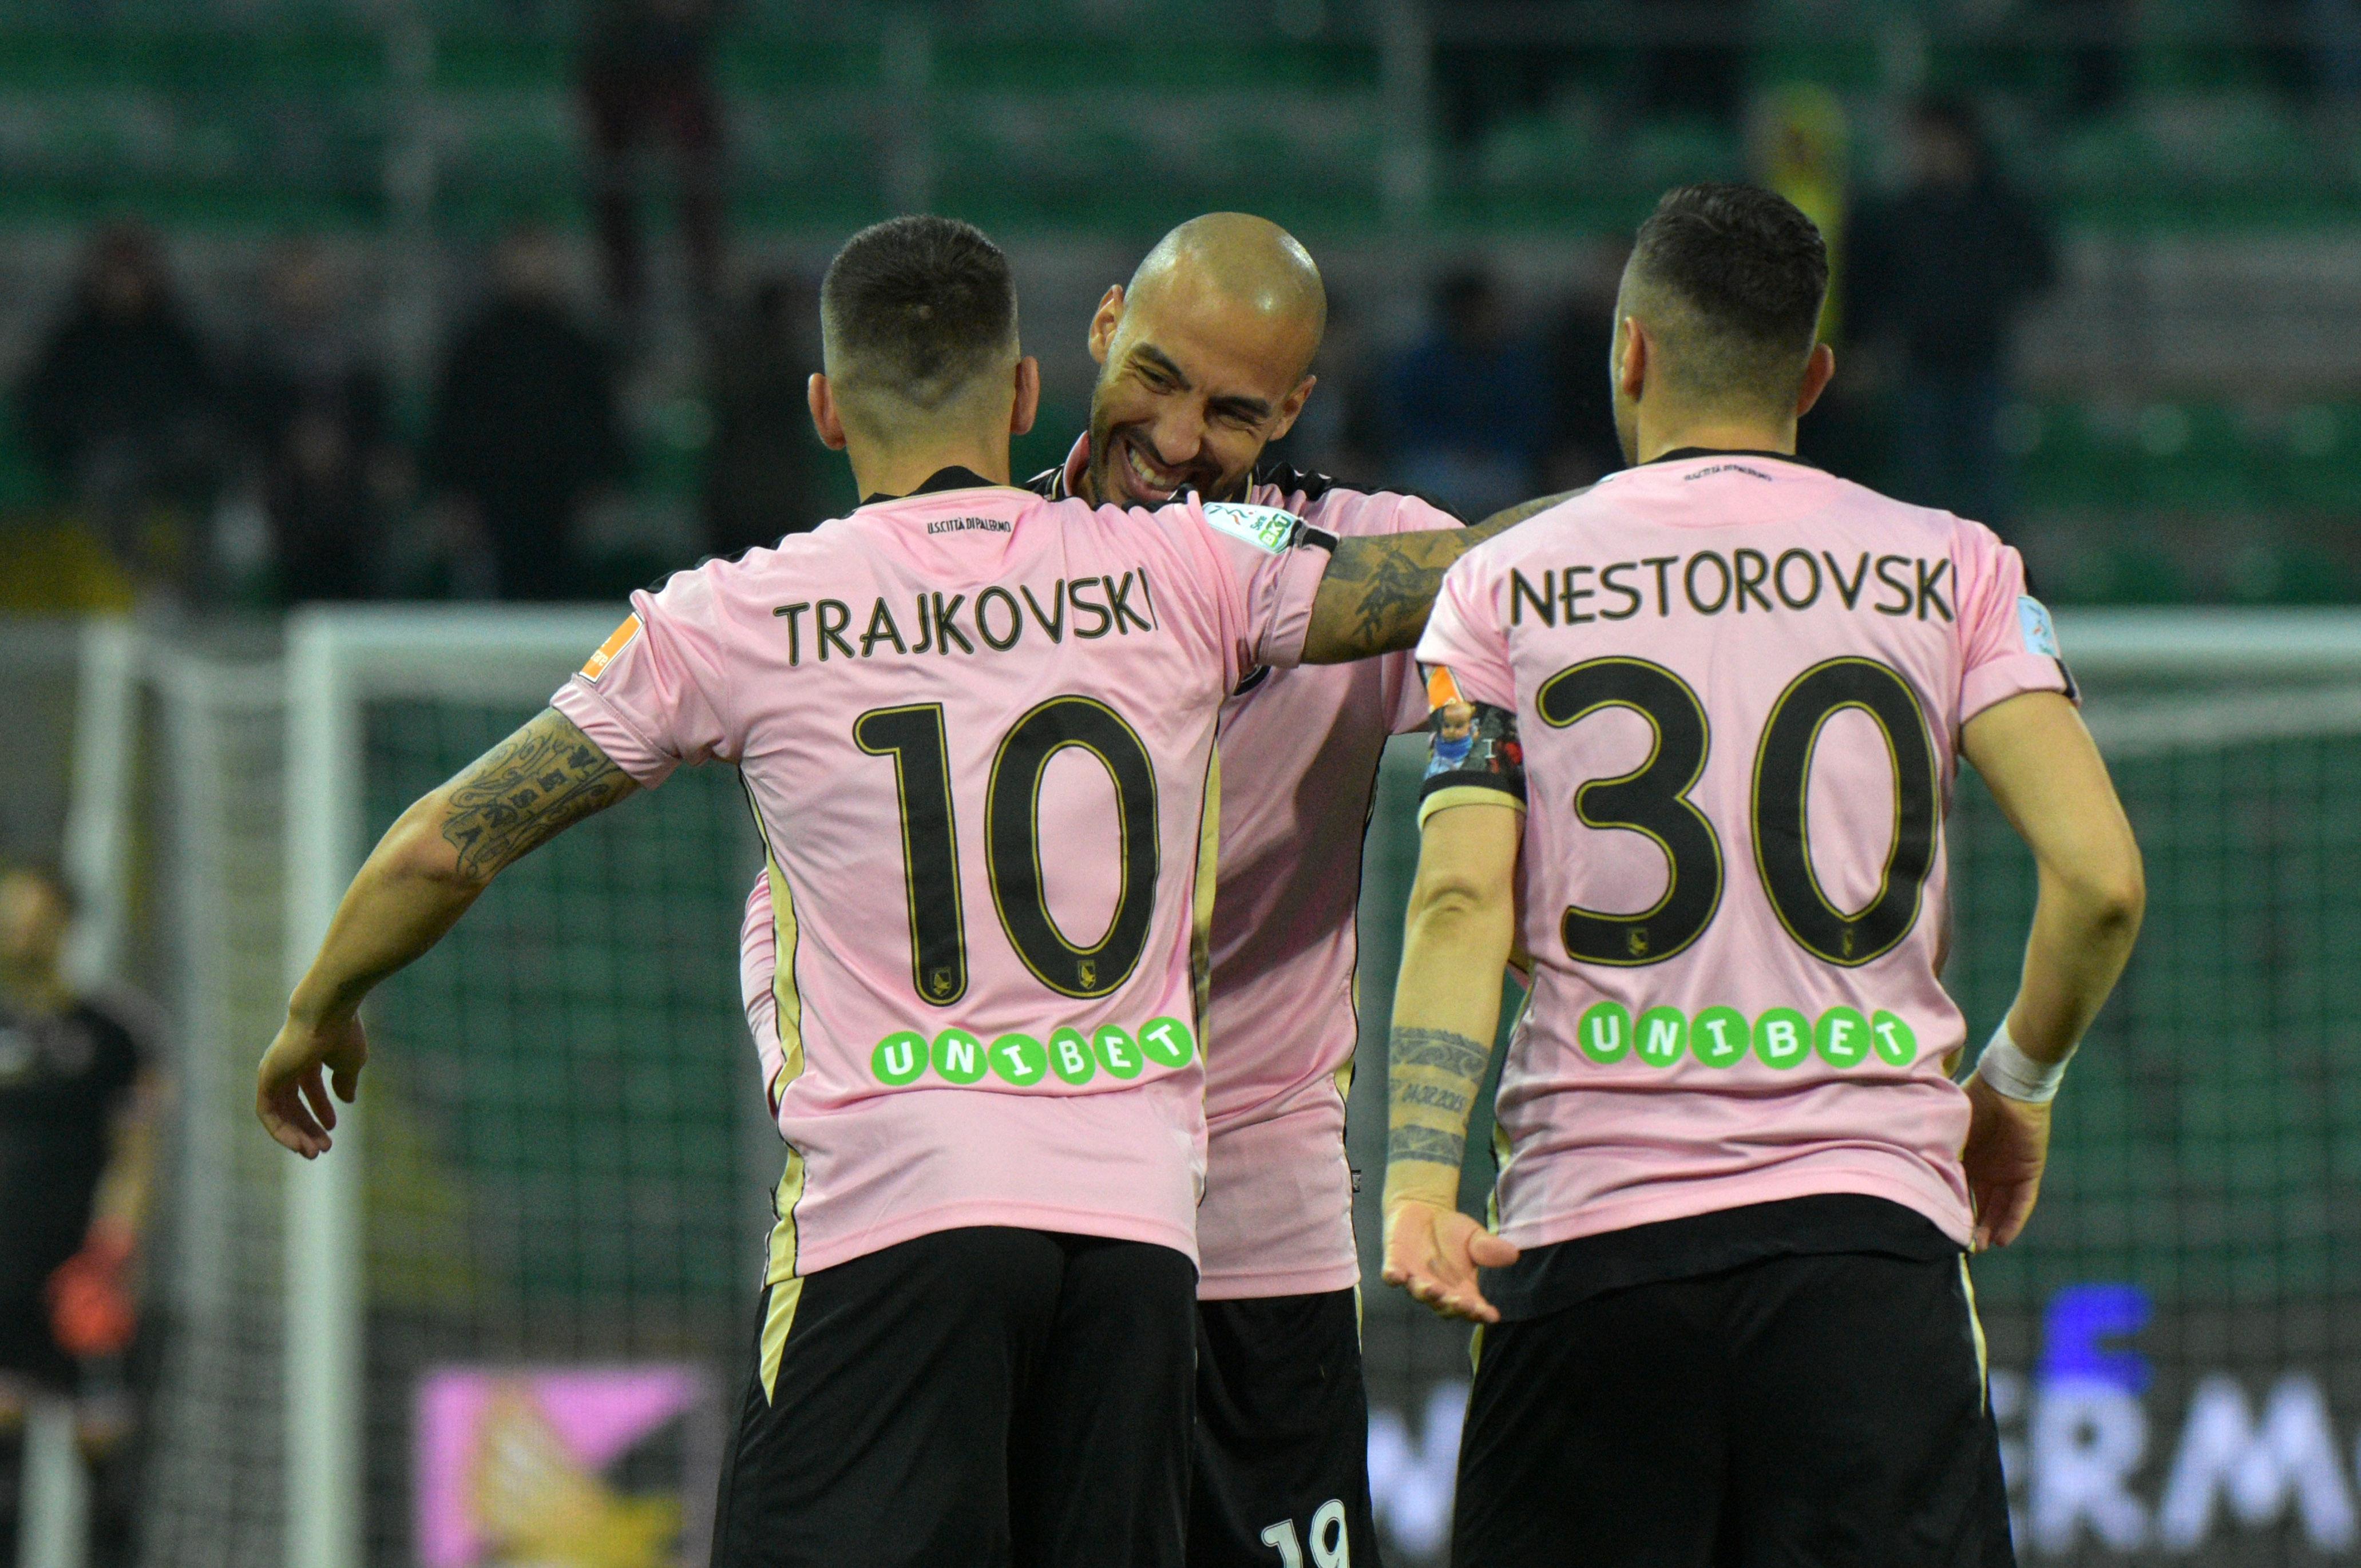 Palermo - Lecce gol trajkovski